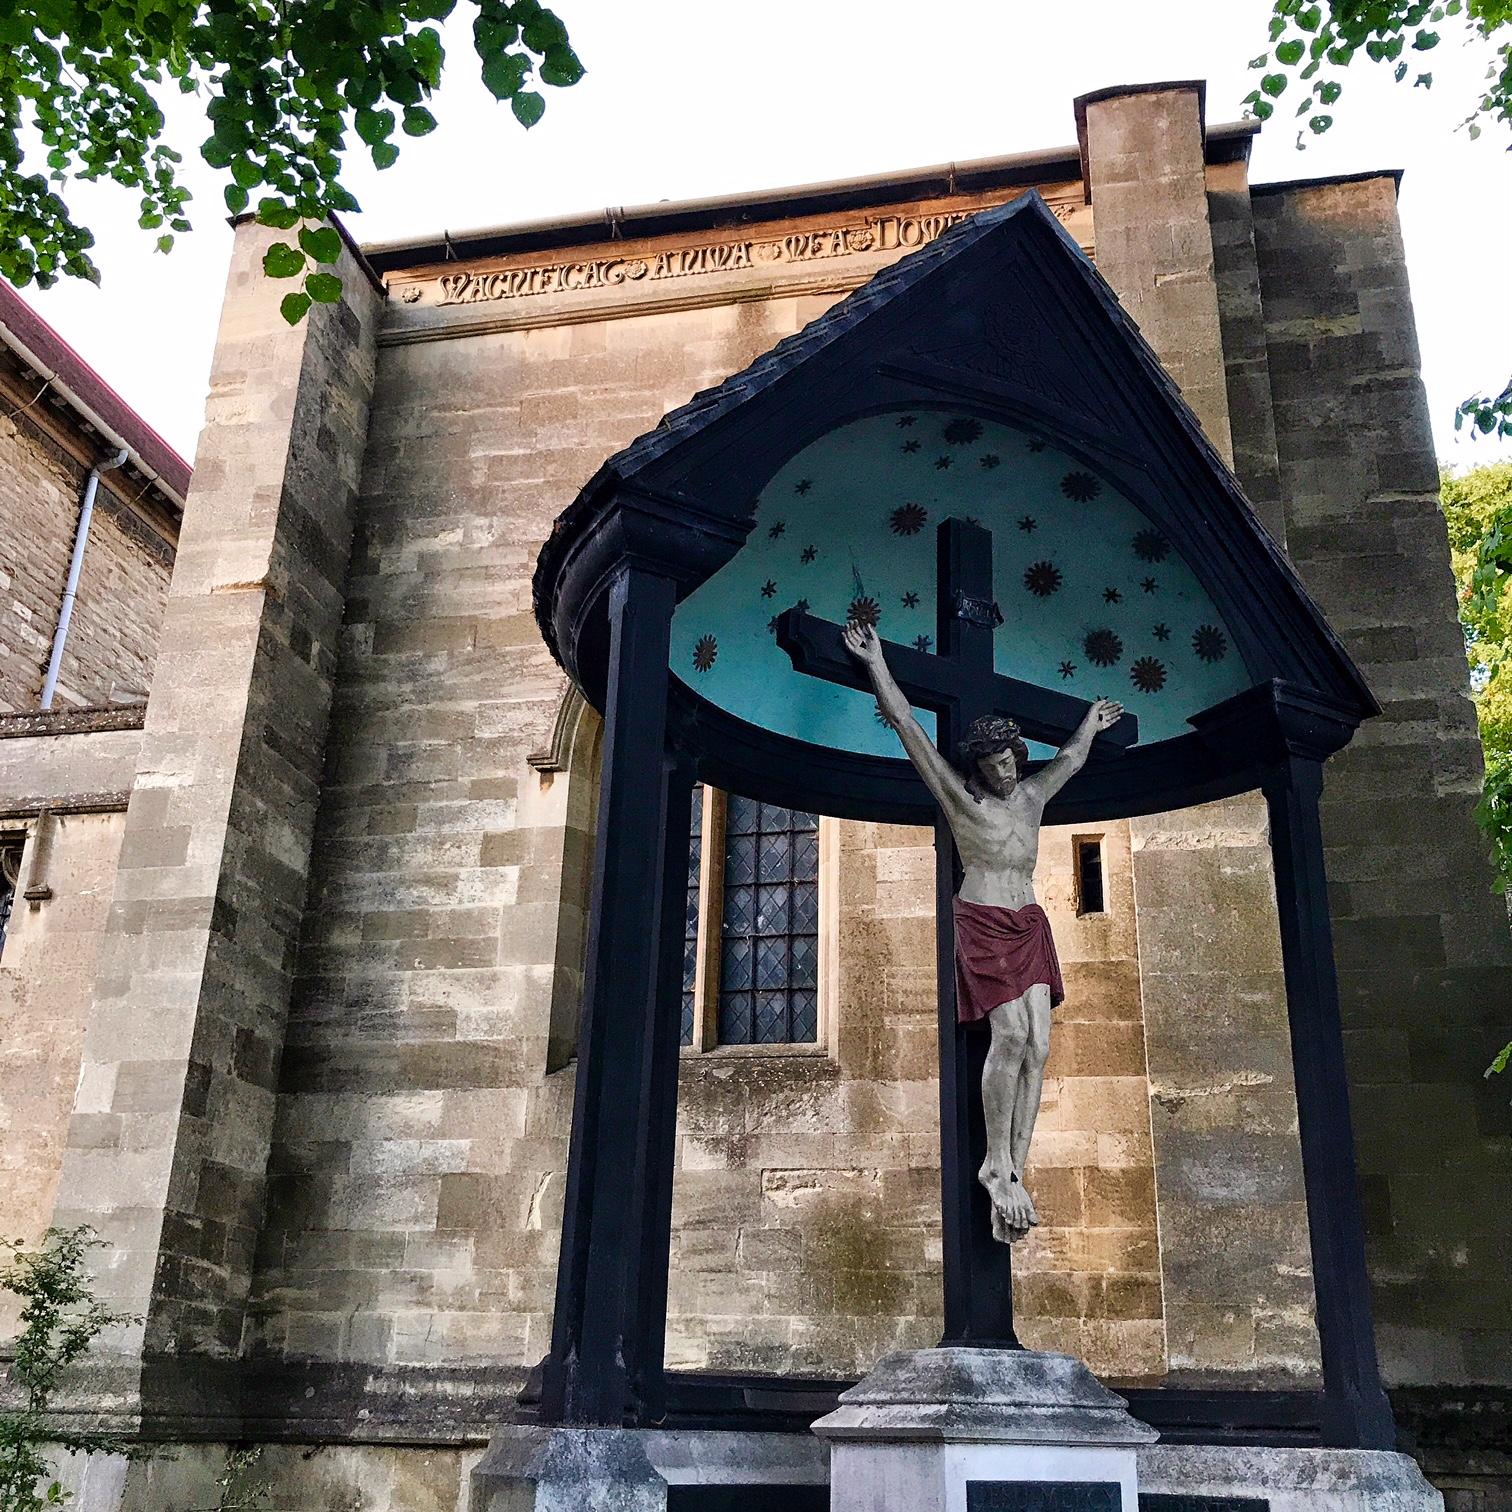 St. Margaret's Church, Oxford